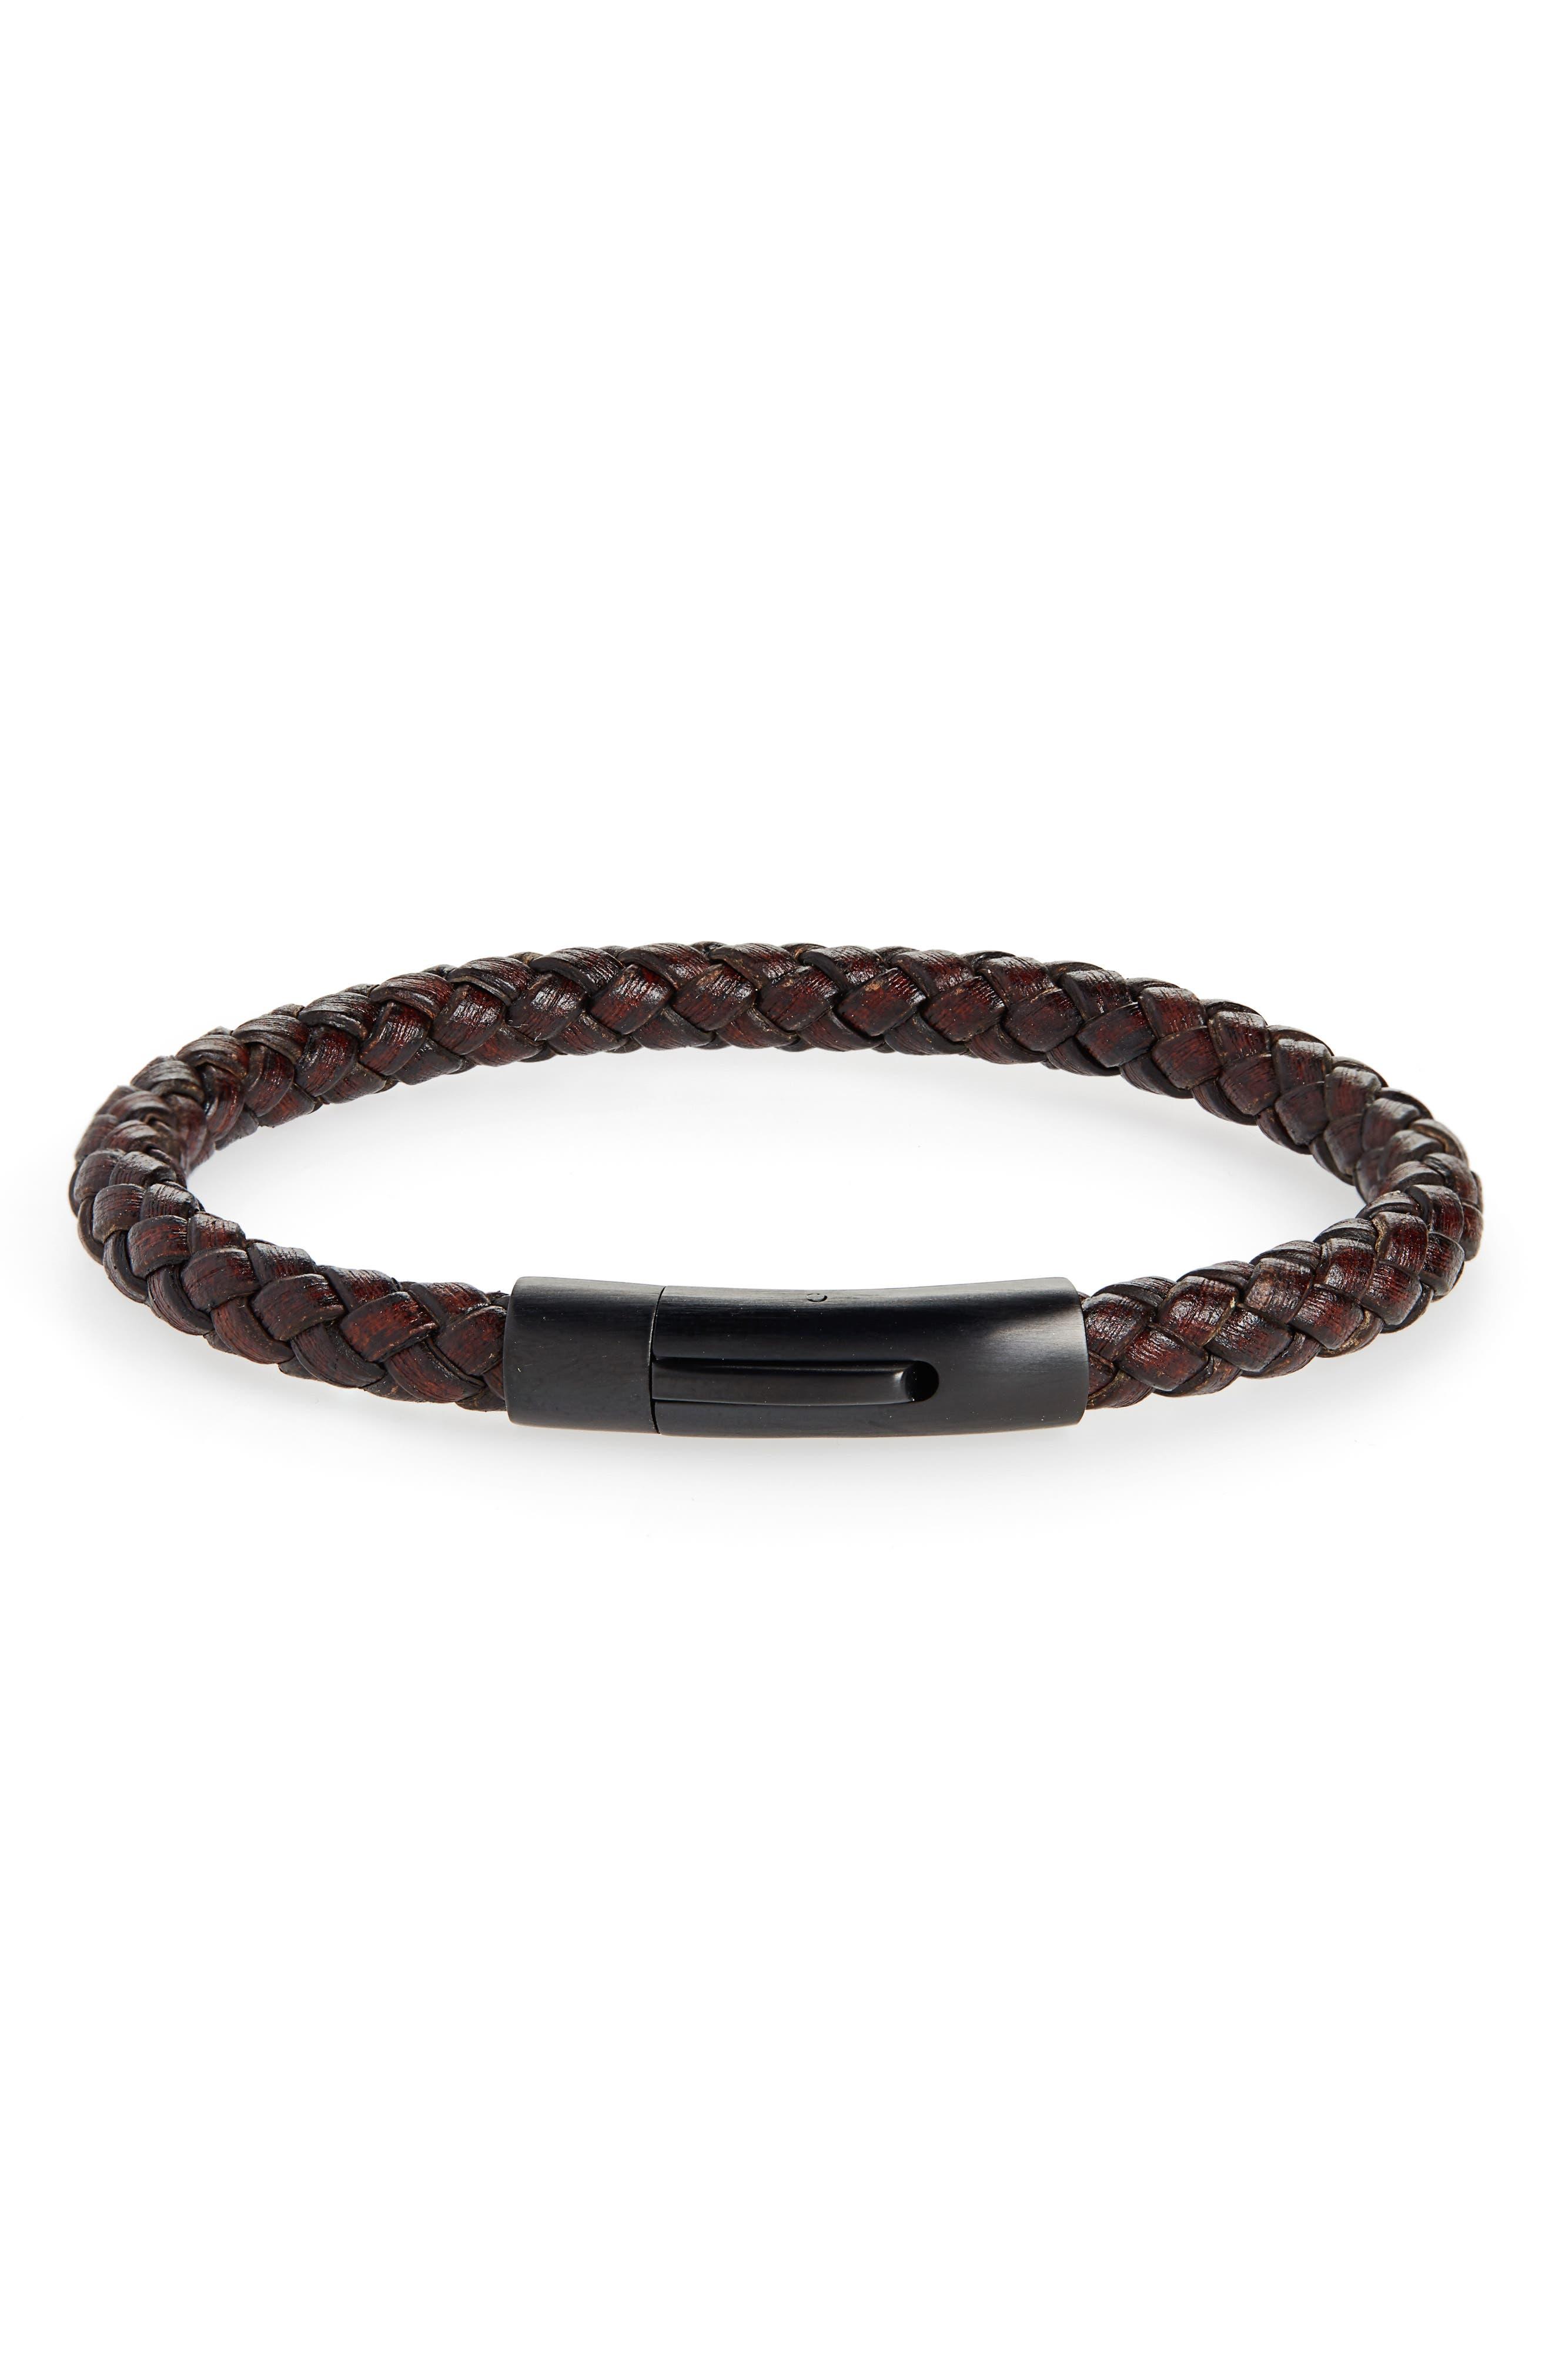 NORDSTROM MEN'S SHOP Braided Leather ID Bracelet, Main, color, BROWN/ BLACK